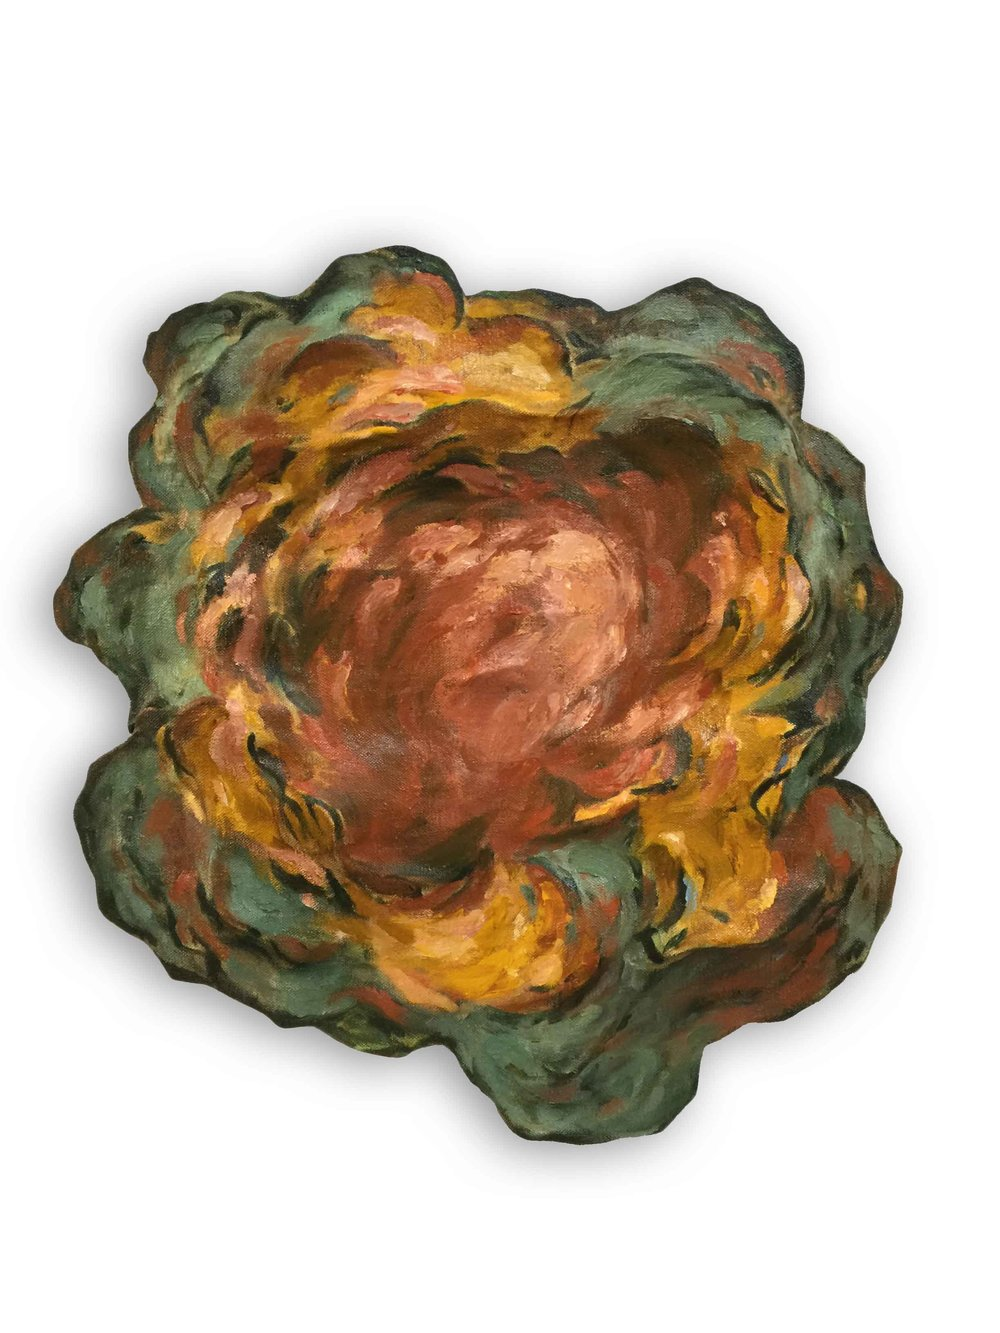 Untitled (Orange and Green)